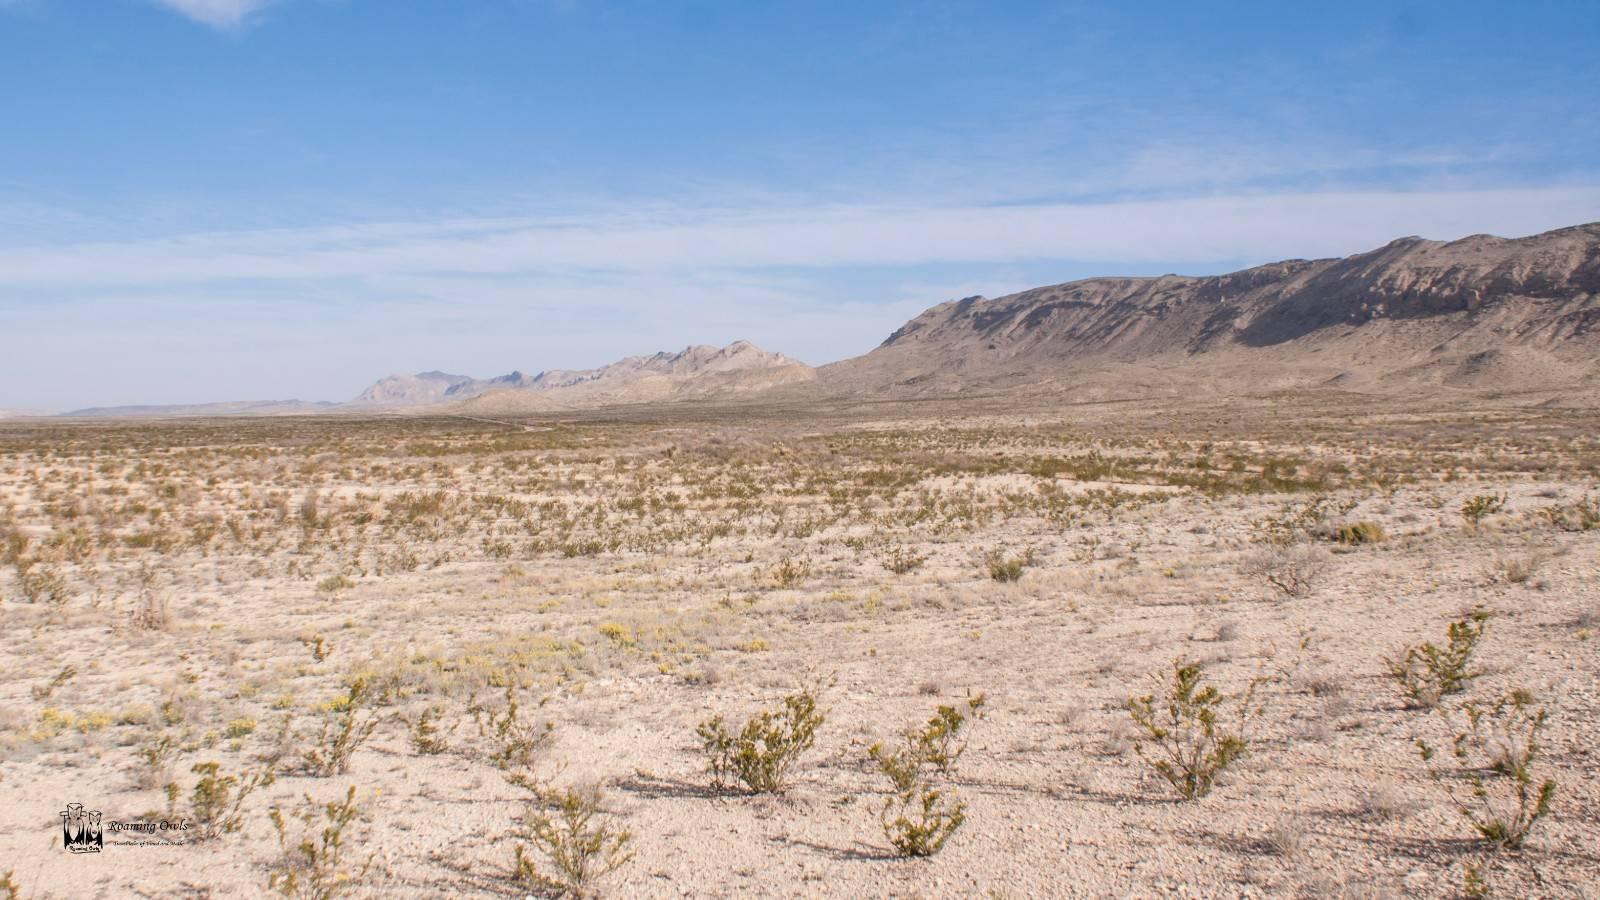 Chisos mountain range, big bend national park,yellow flowers, desert,barren land